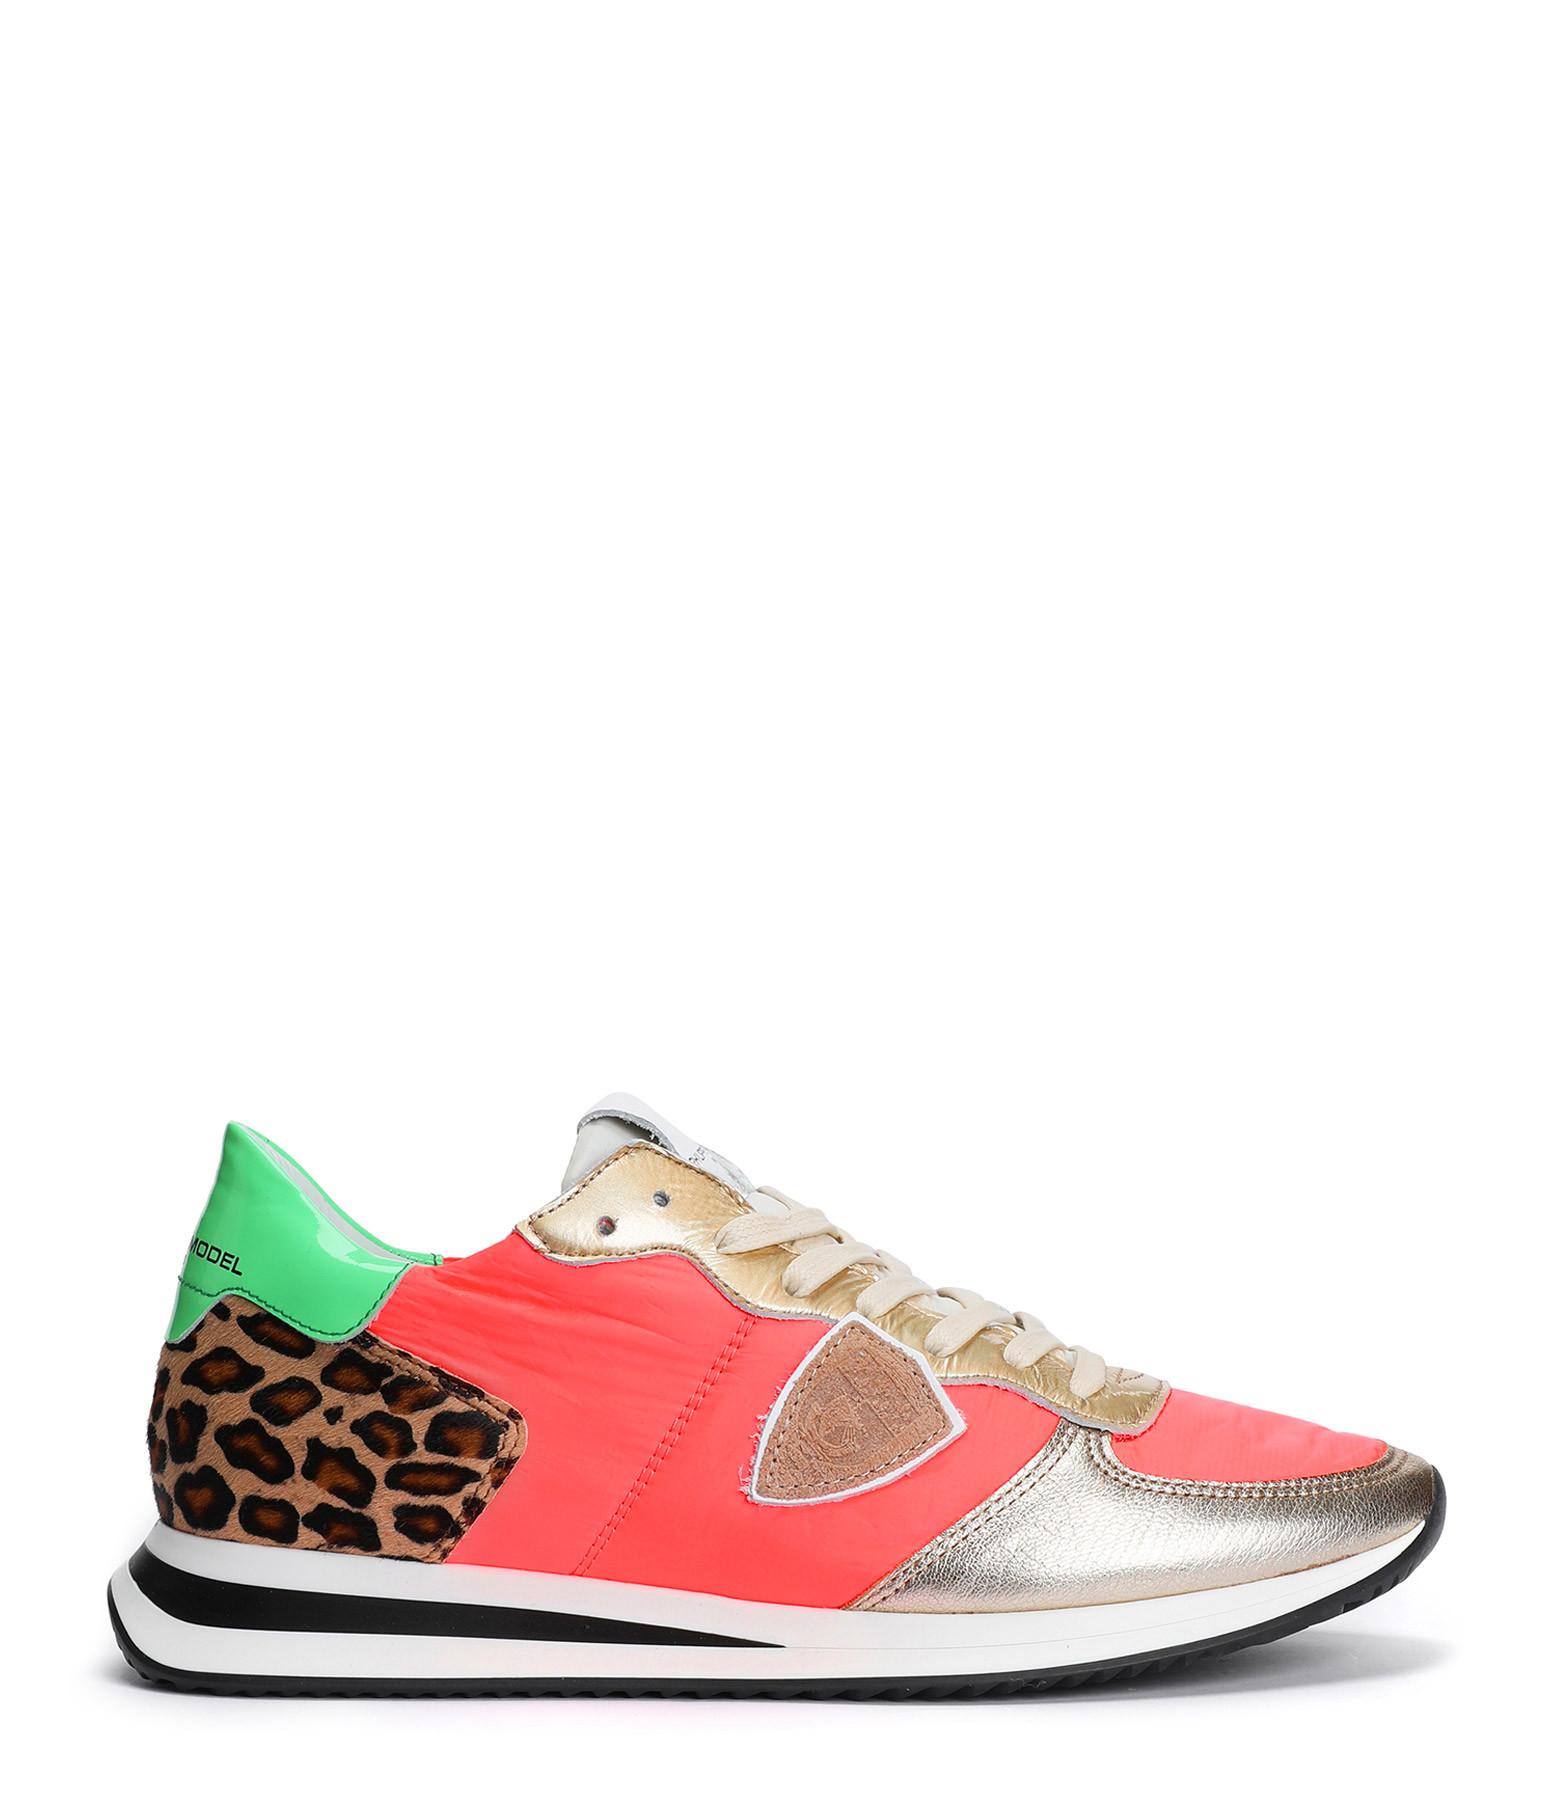 PHILIPPE MODEL - Baskets Trpx Neon Pop Corail